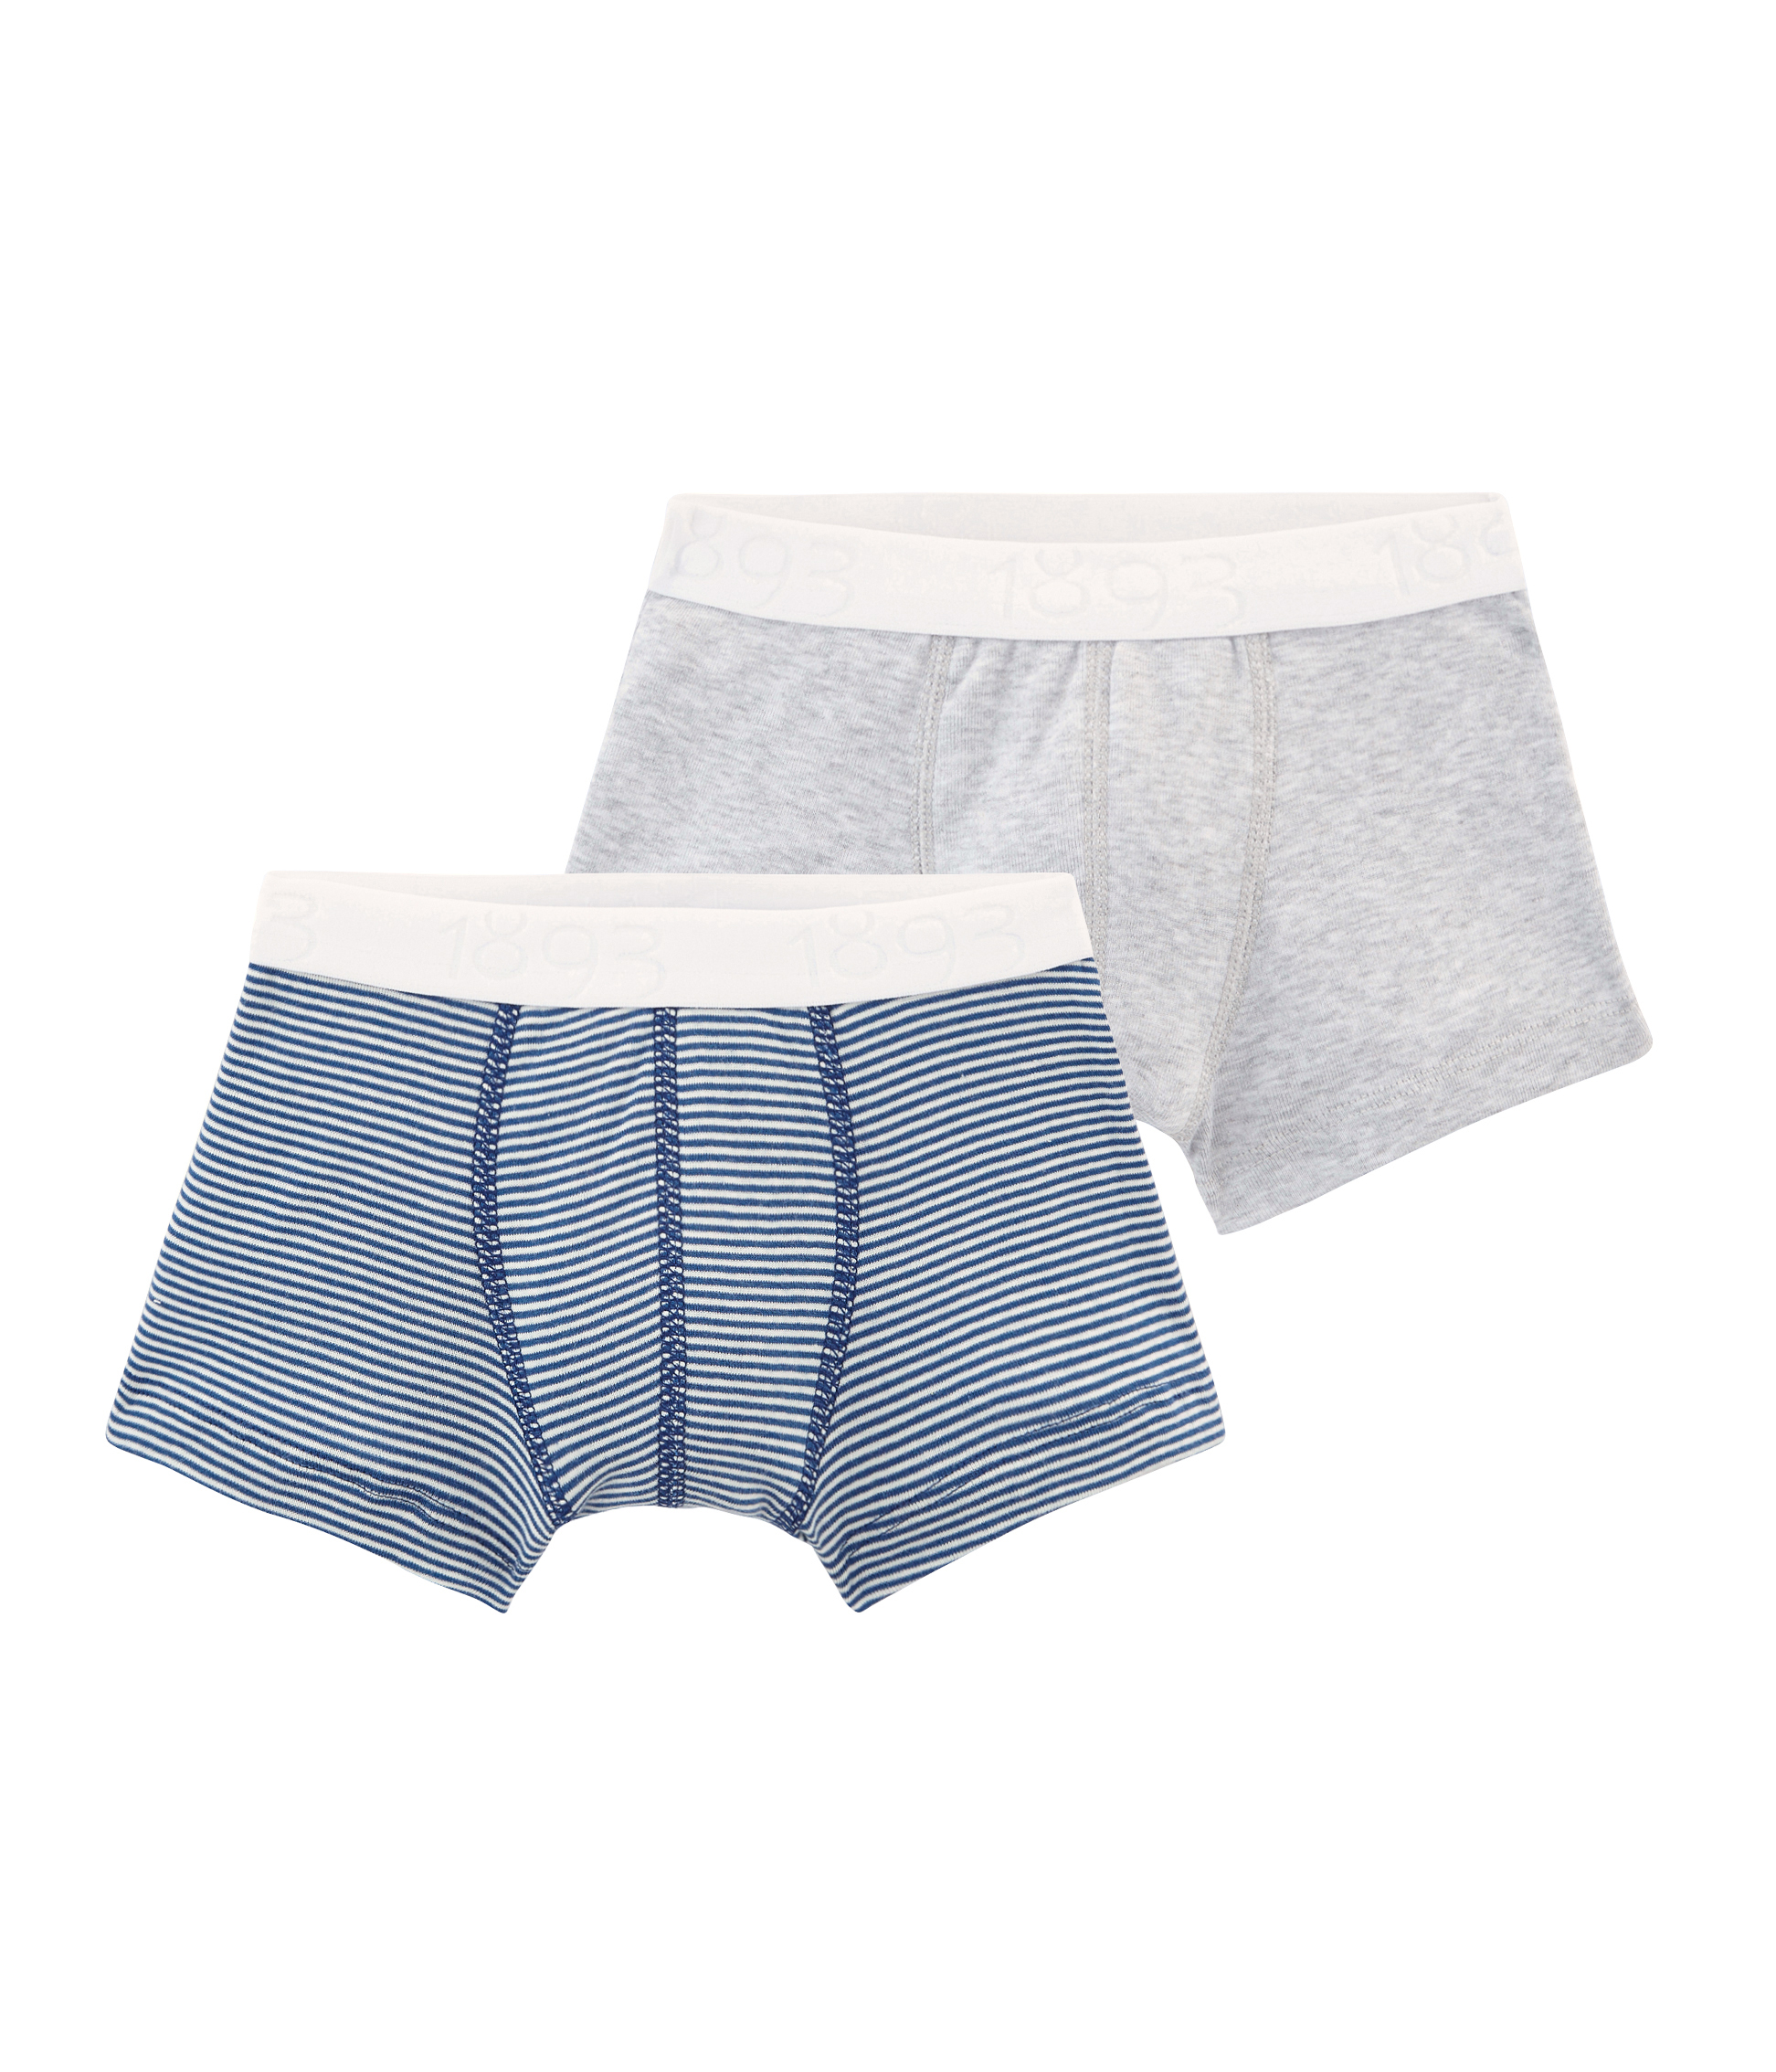 Pack of 2 Petit Bateau Boys Boxer Shorts